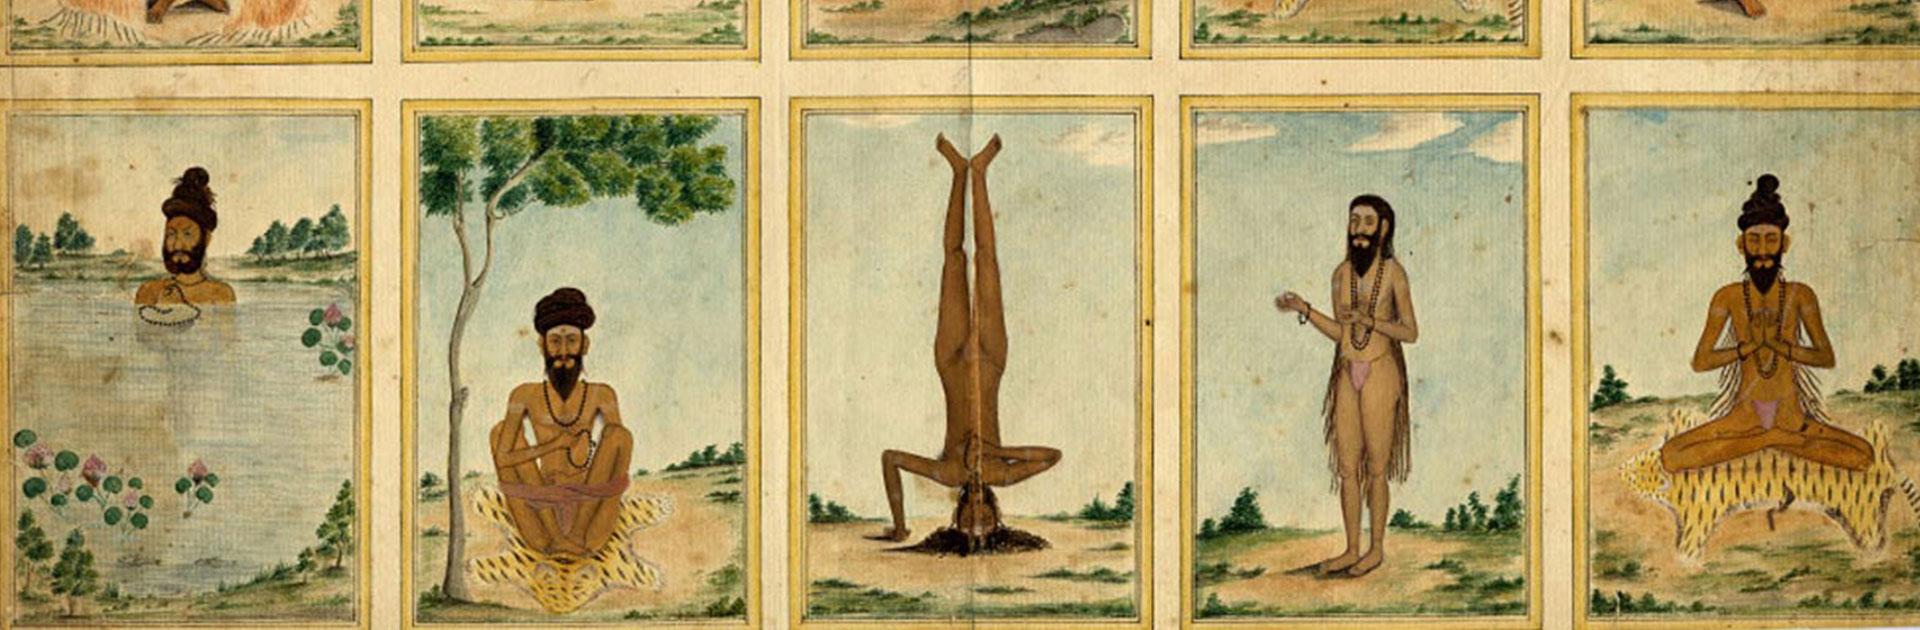 Yoga Origin Evolution And The Self